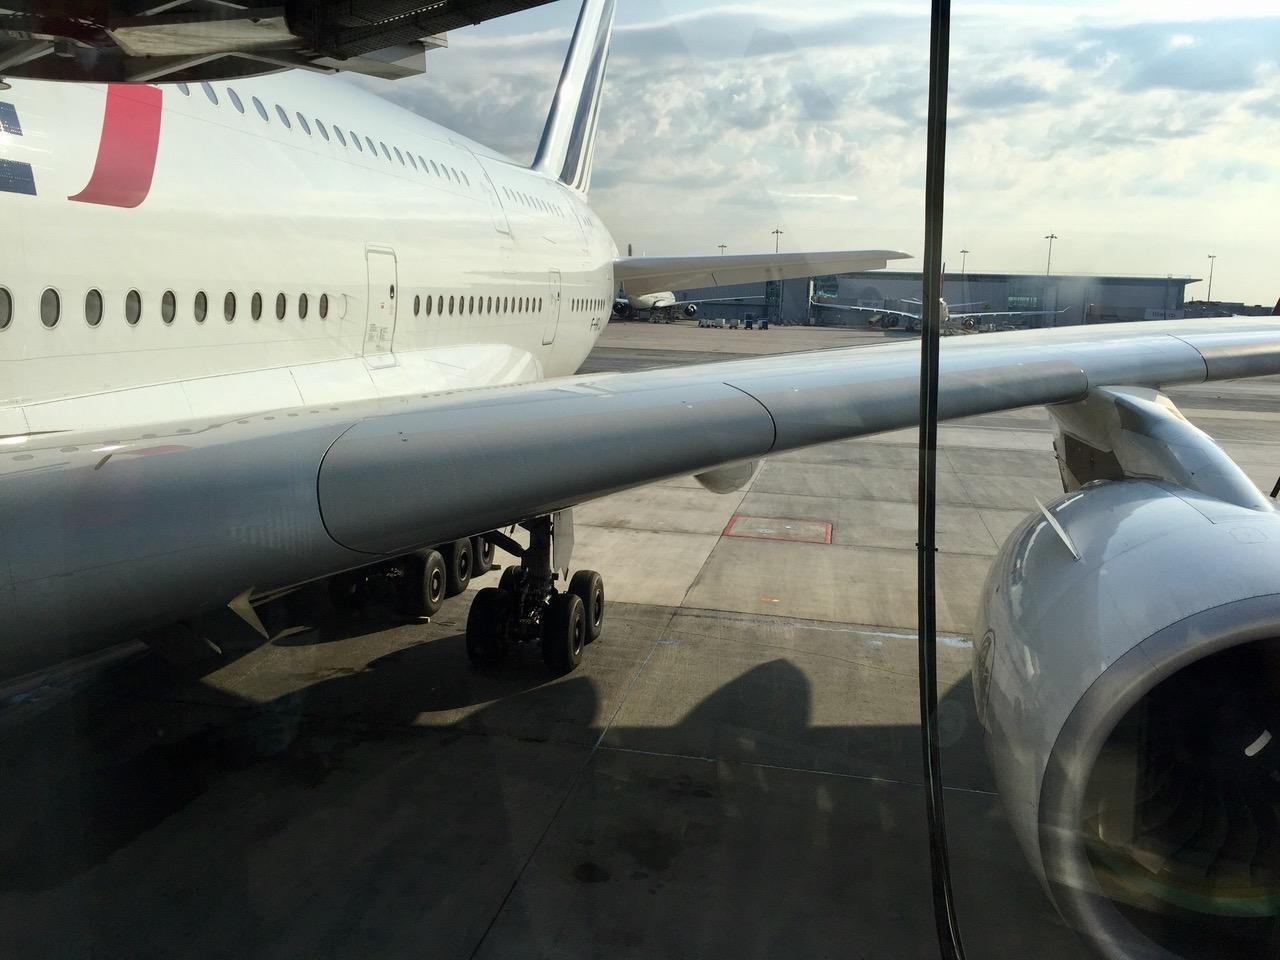 The view before boarding—beautiful aeronautic design!